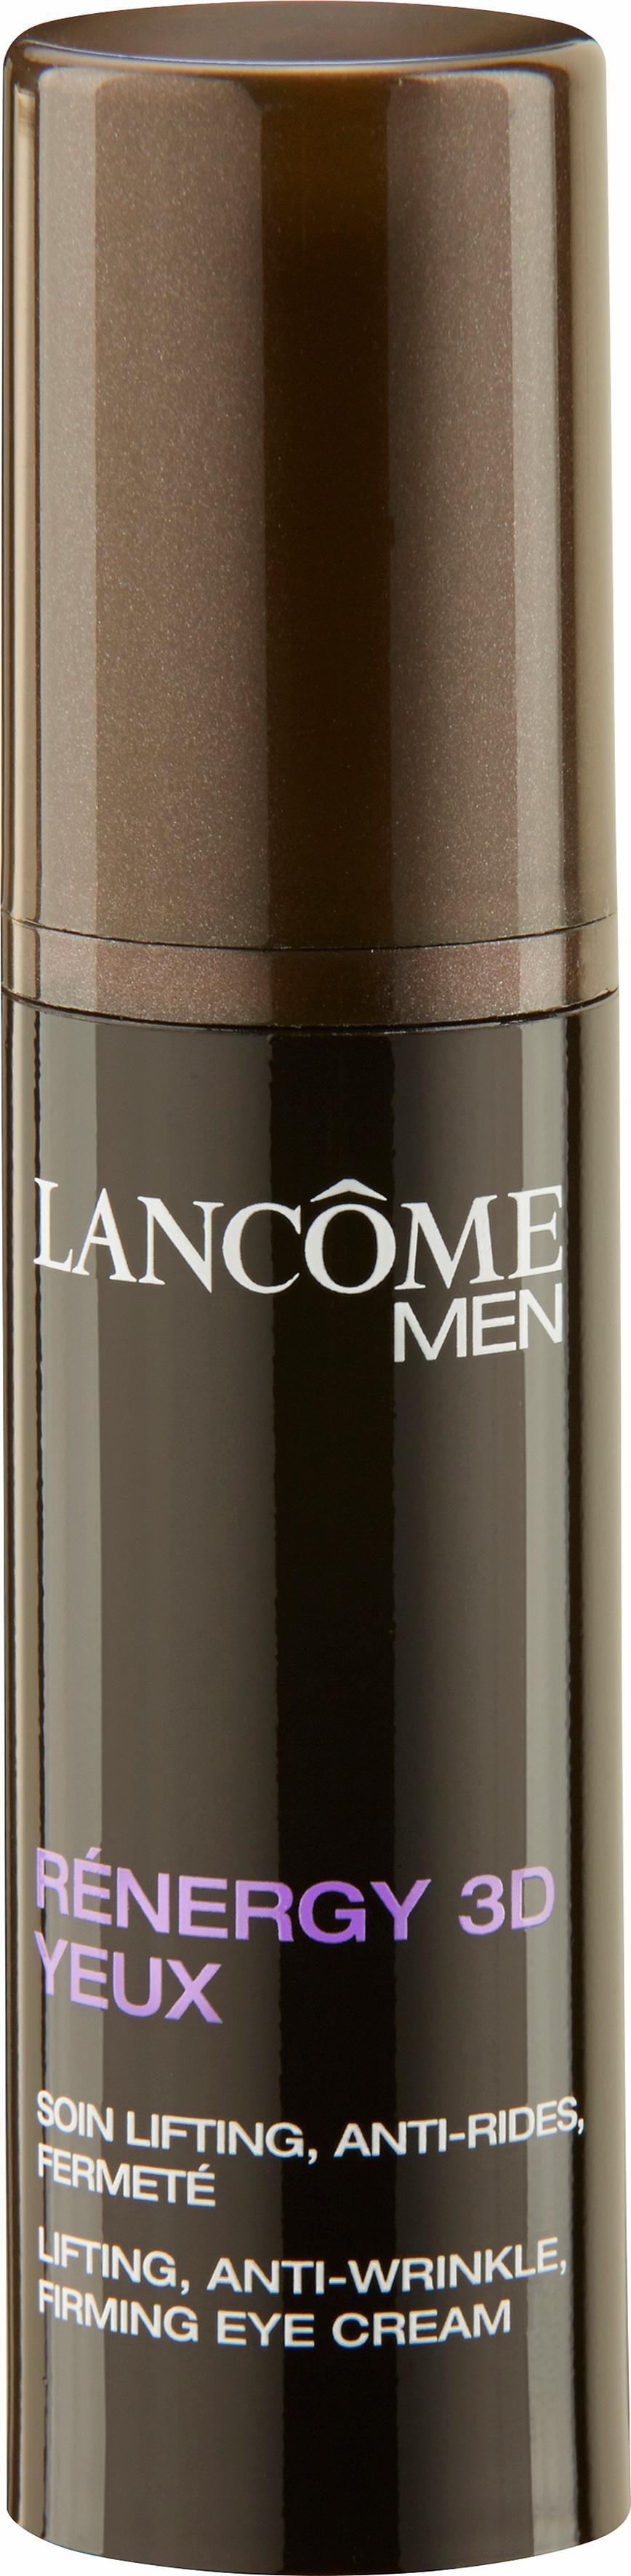 Lancôme Men, »Rénergy 3D Yeux«, Straffende Anti-Falten Augenpflege